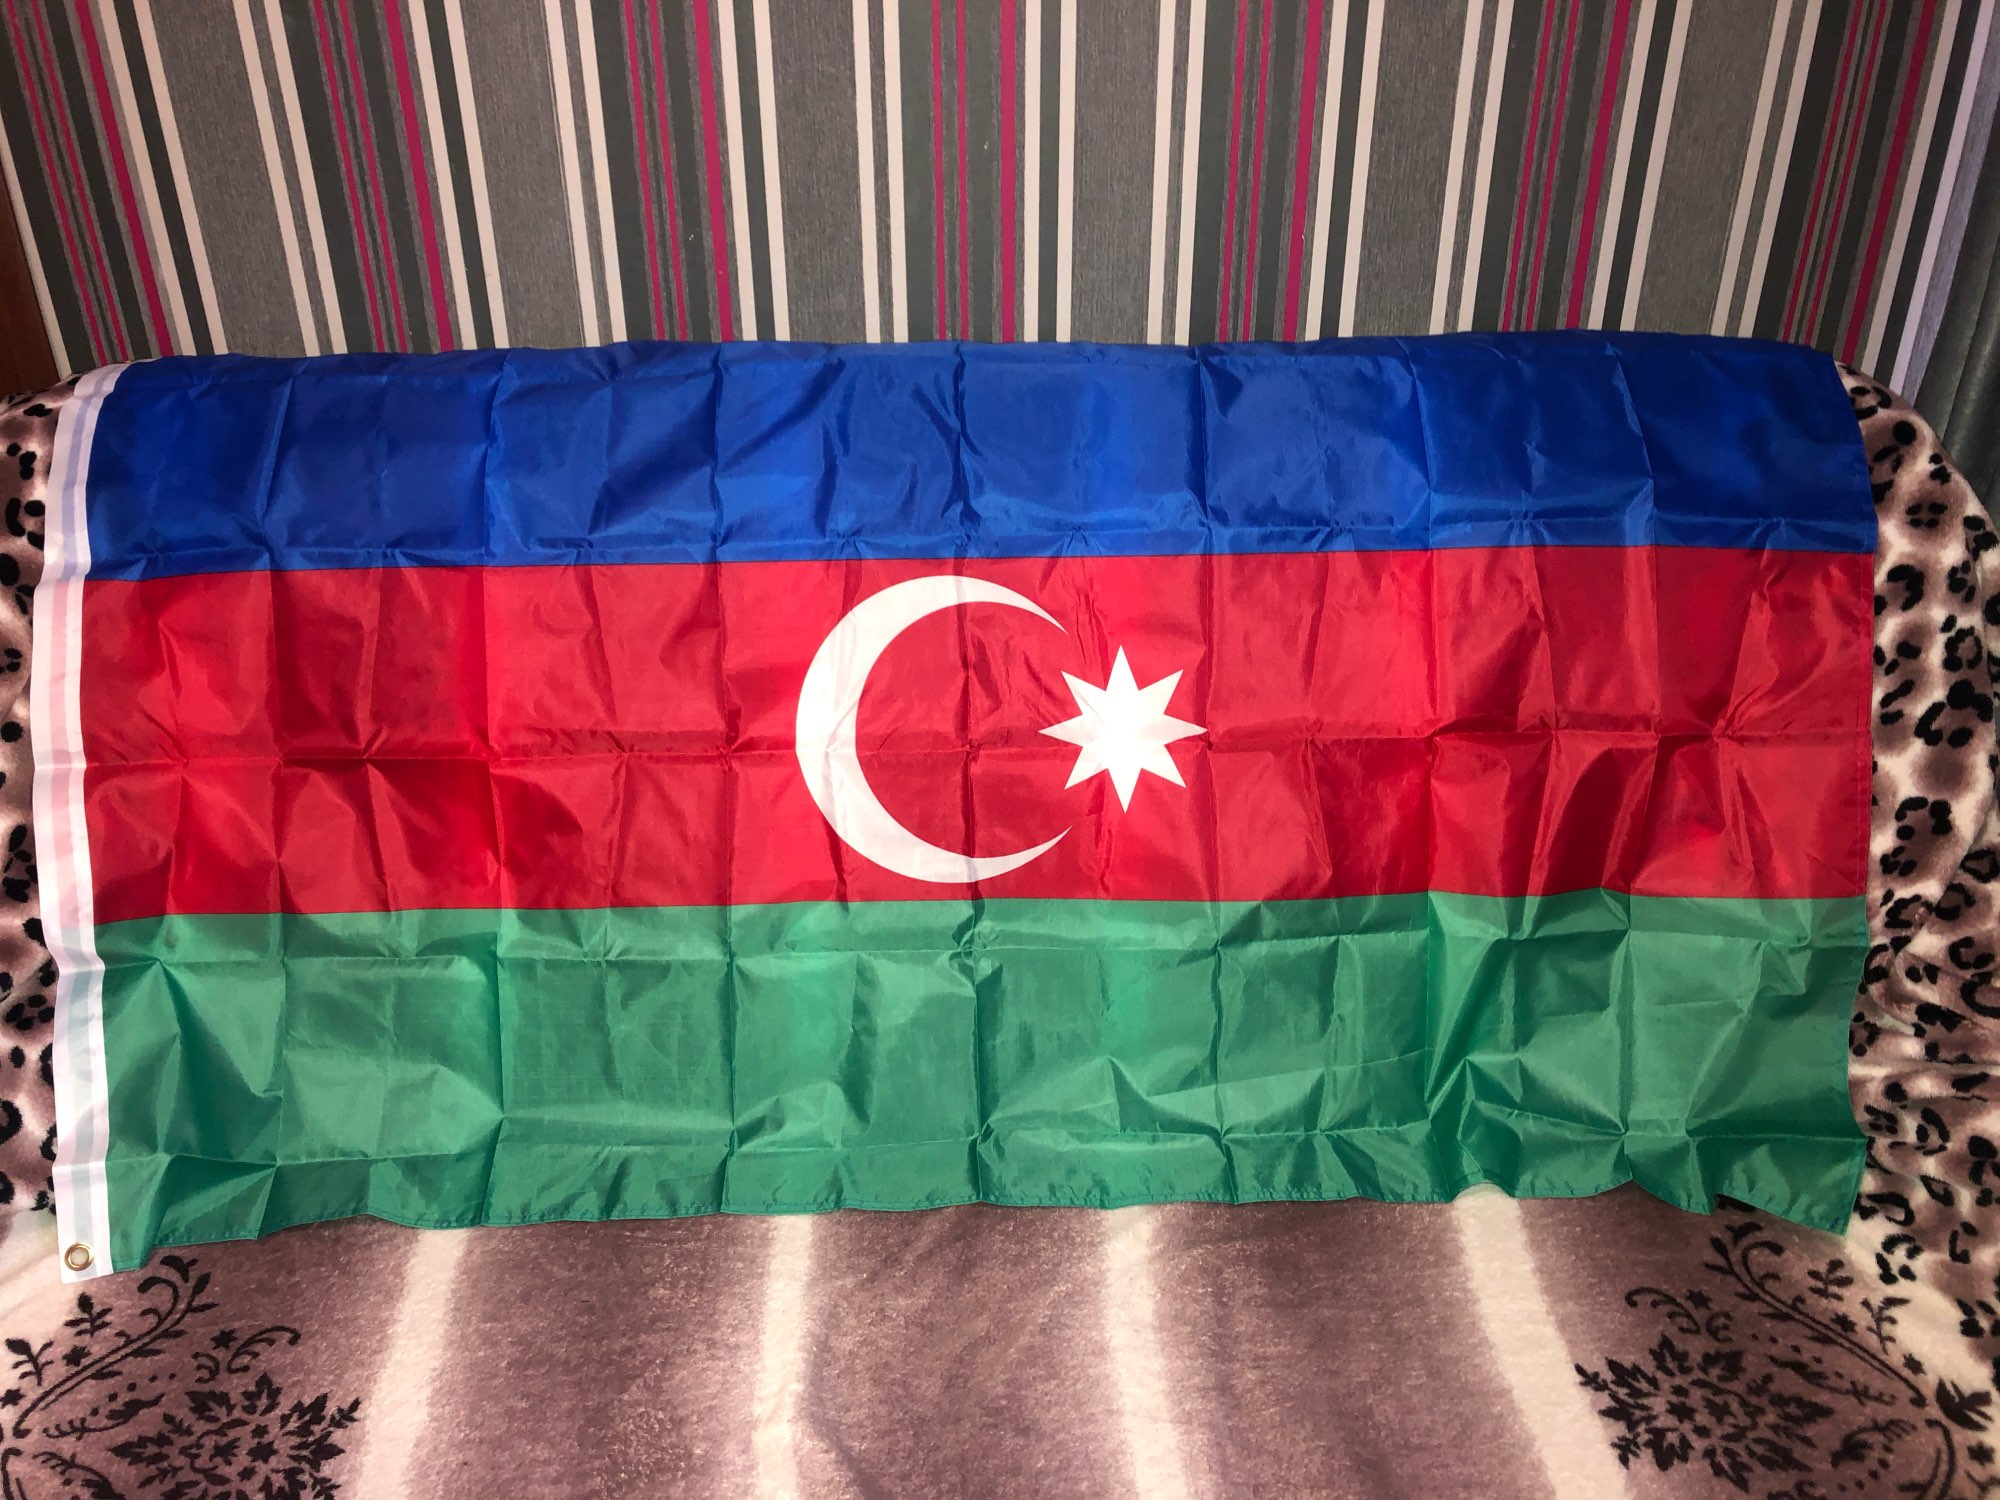 Azerbaijan 90*150cm flag  Hanging National flag Home Decoration flag 201 countries flag national flag symbol fridge magnets combine order accept wholesale business souvenirs